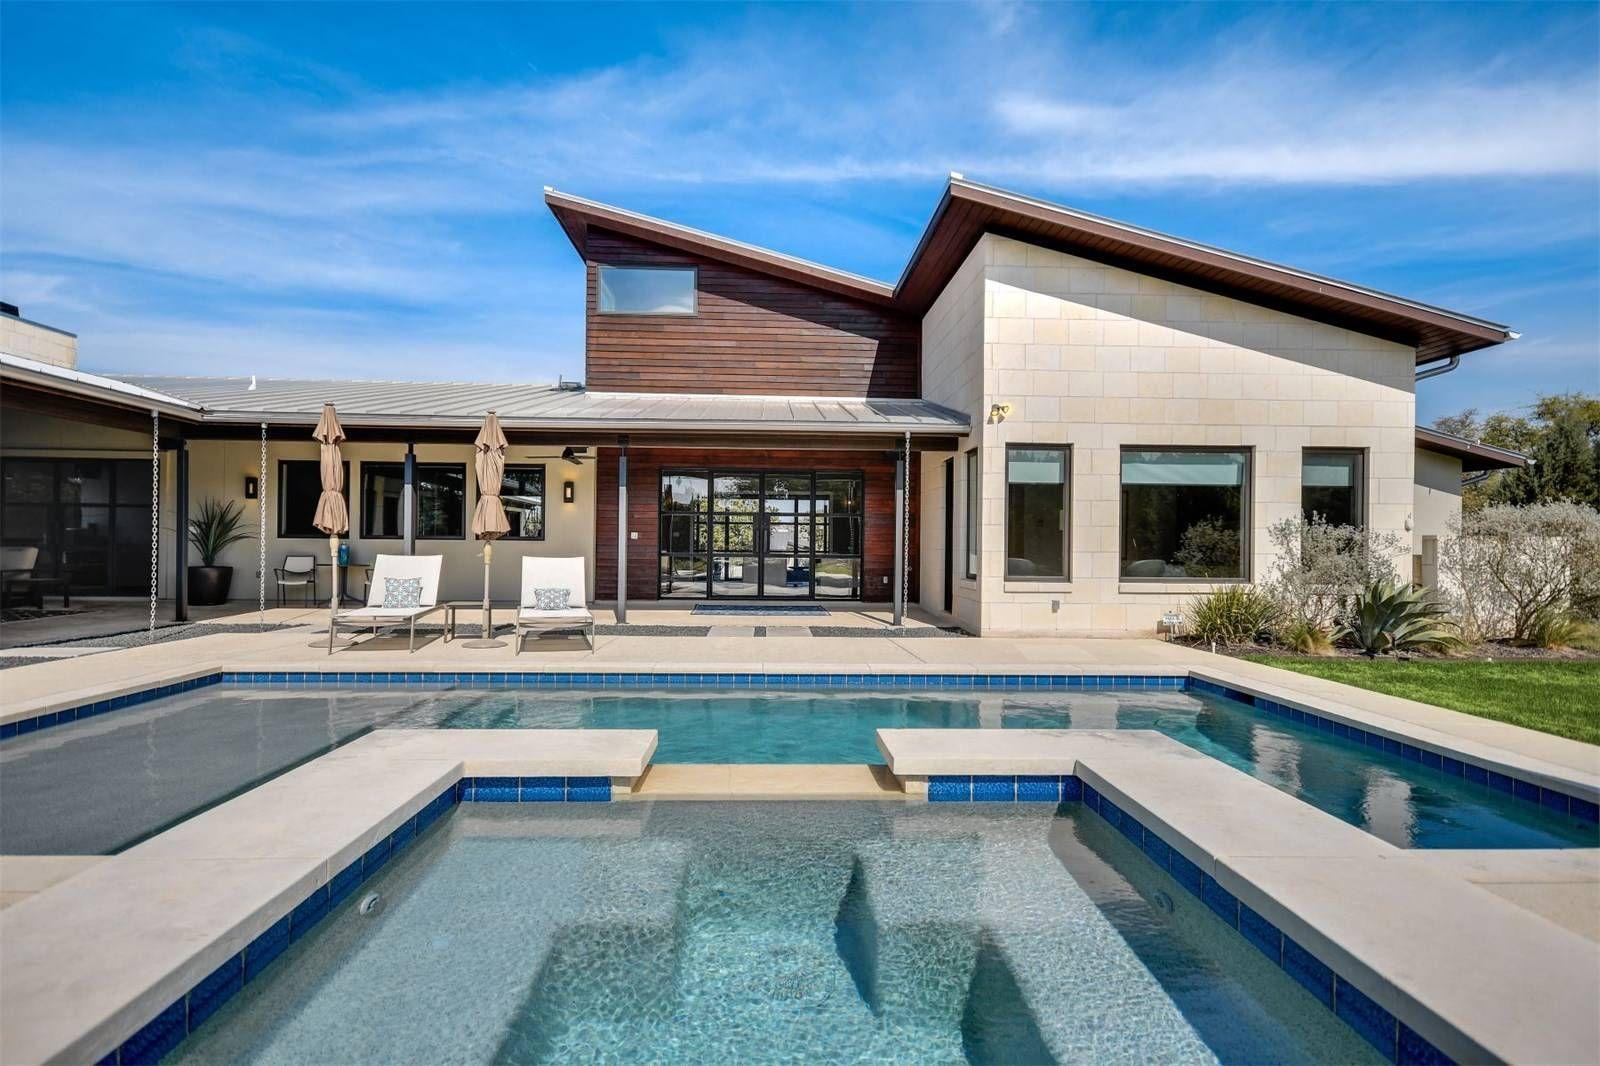 9600 veletta place austin texas united states luxury